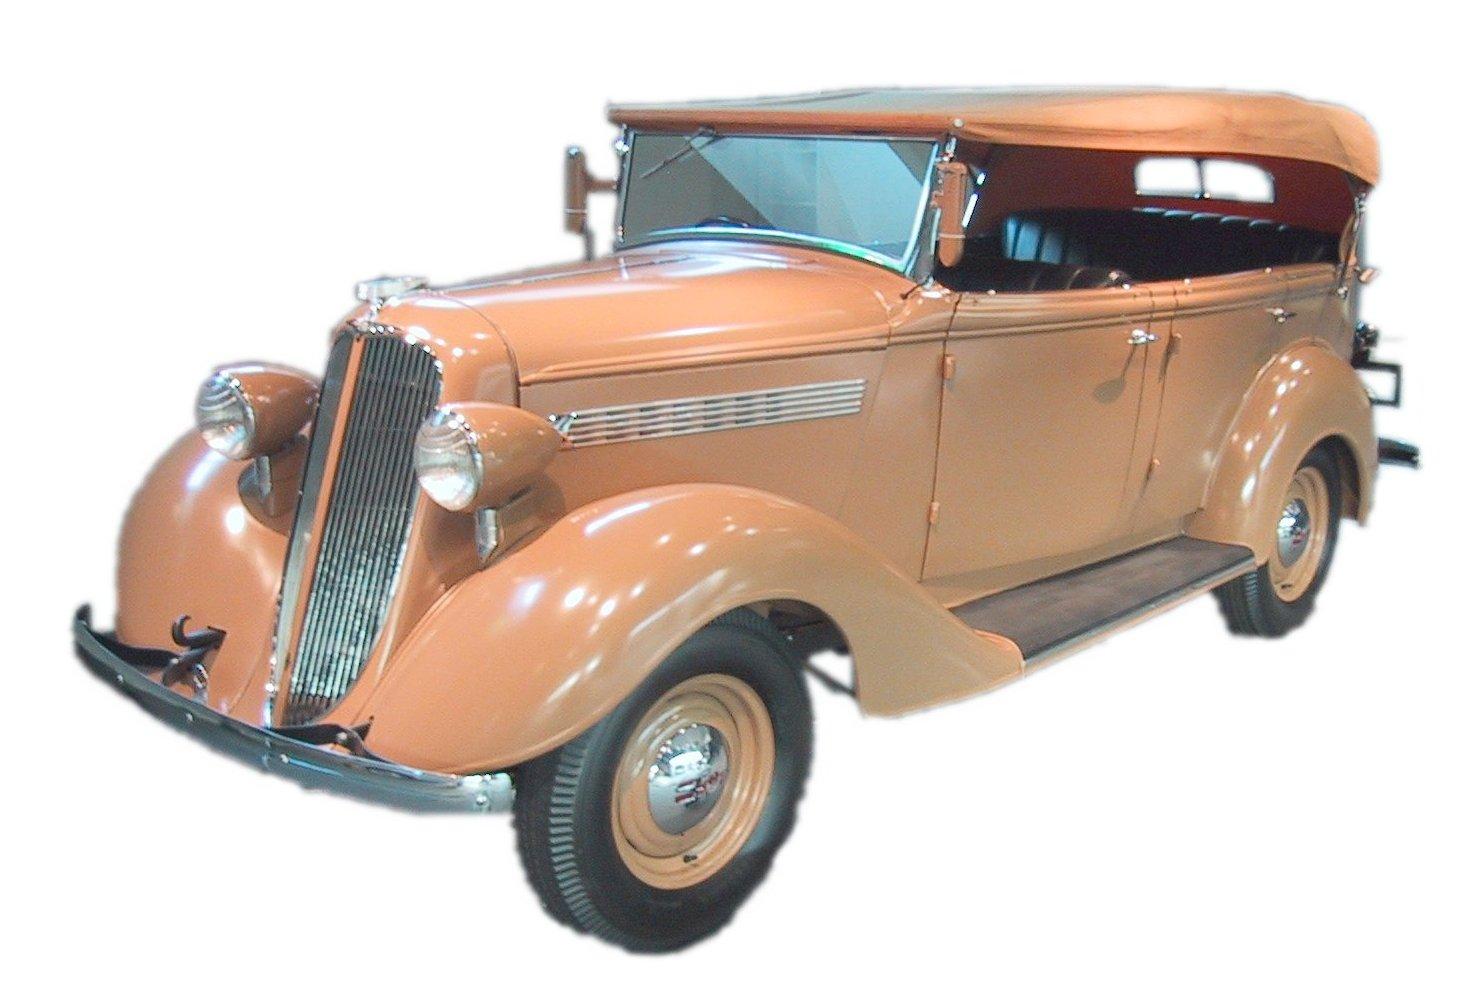 Nissan Model 70 Phaeton, 1938